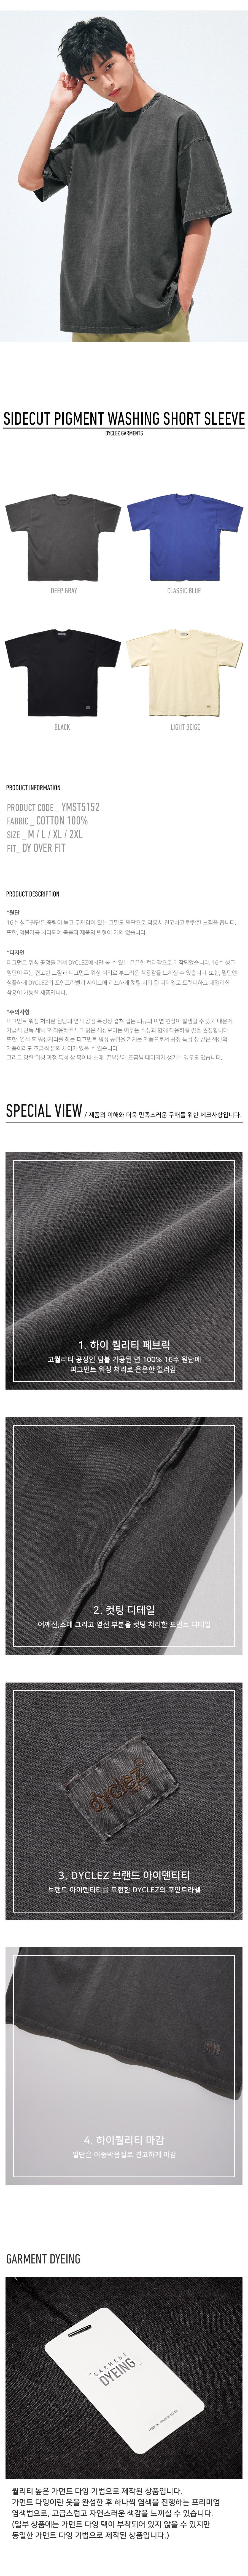 20200522_dy_sidecut_tshirts_intro_sh.jpg